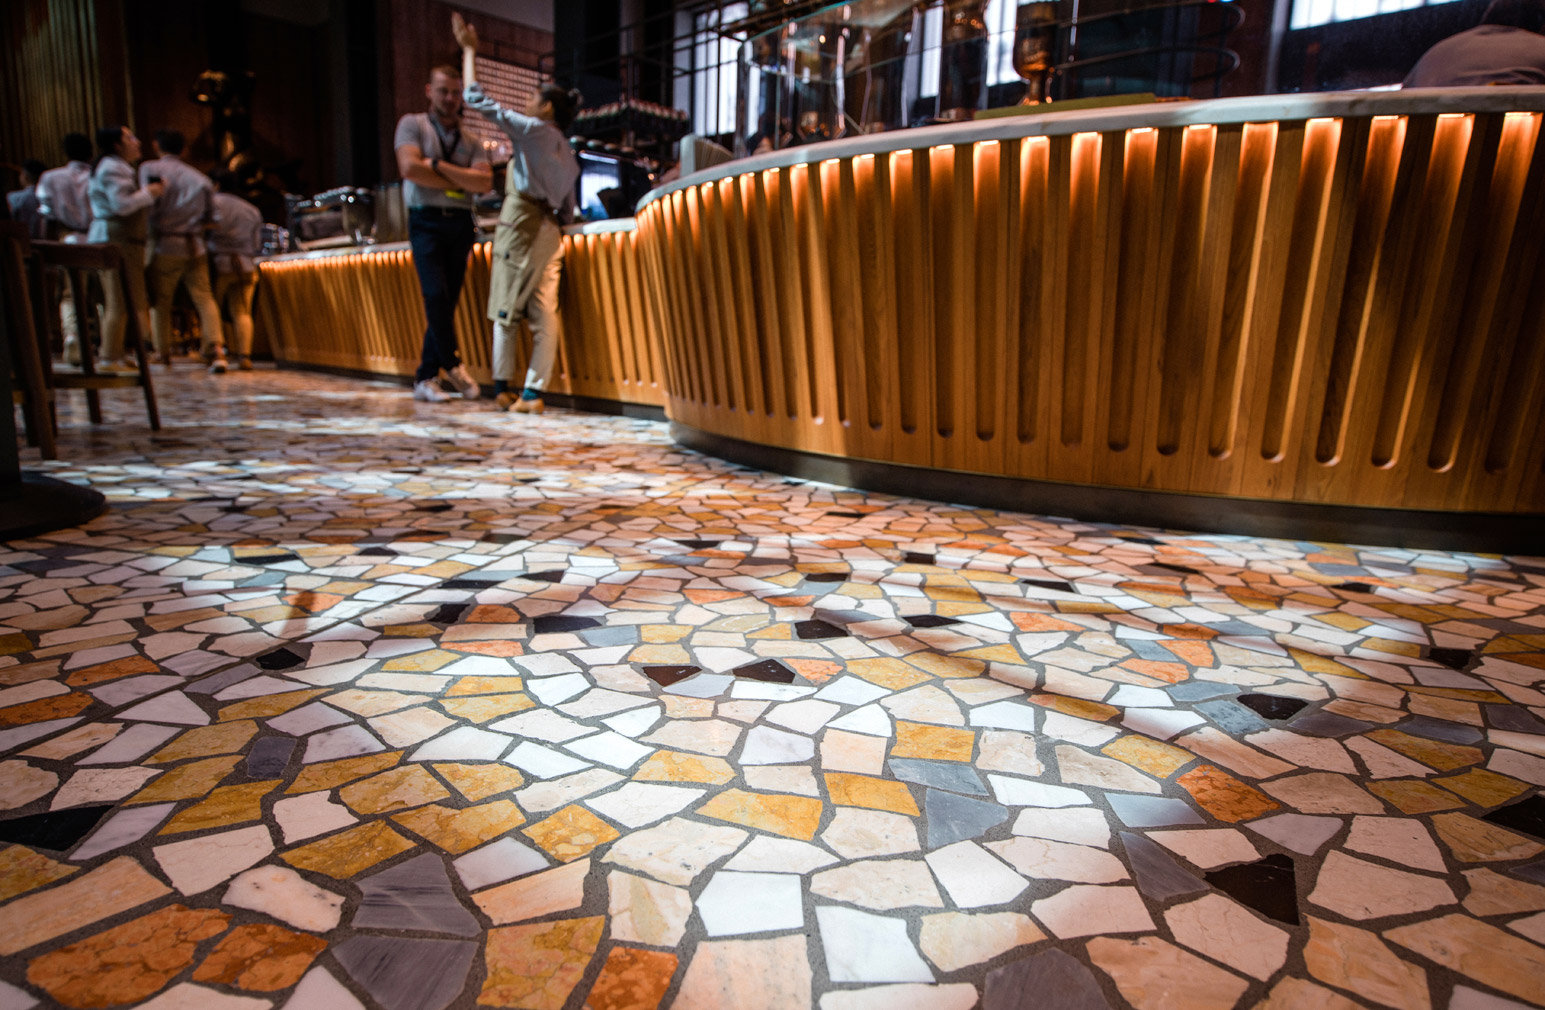 The Starbucks Reserve Roastery